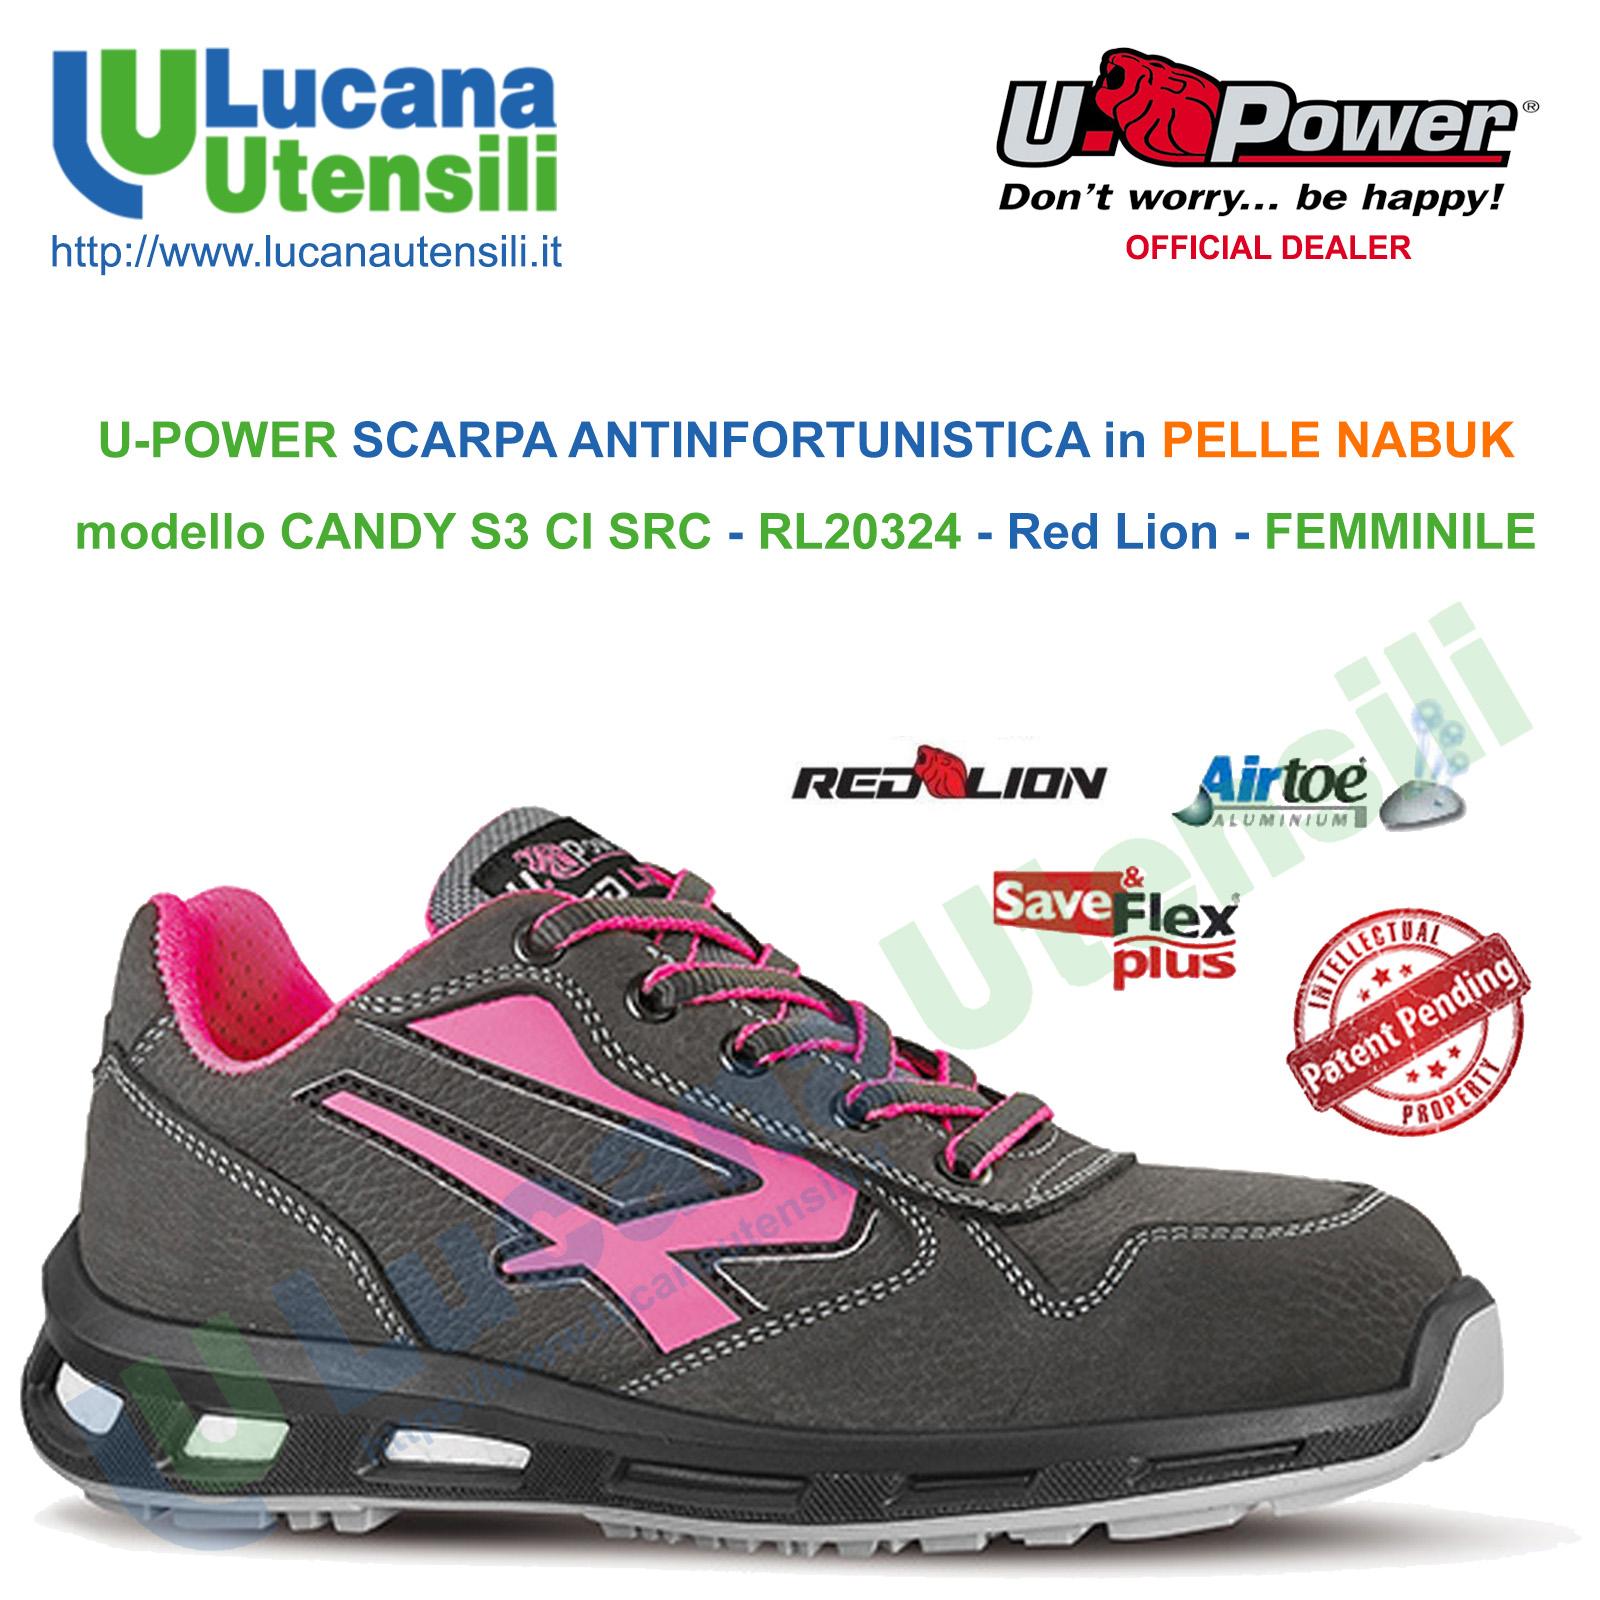 Upower Scarpa Scarpe lavoro antinfortunistica pelle S3 alta  LION U-POWER